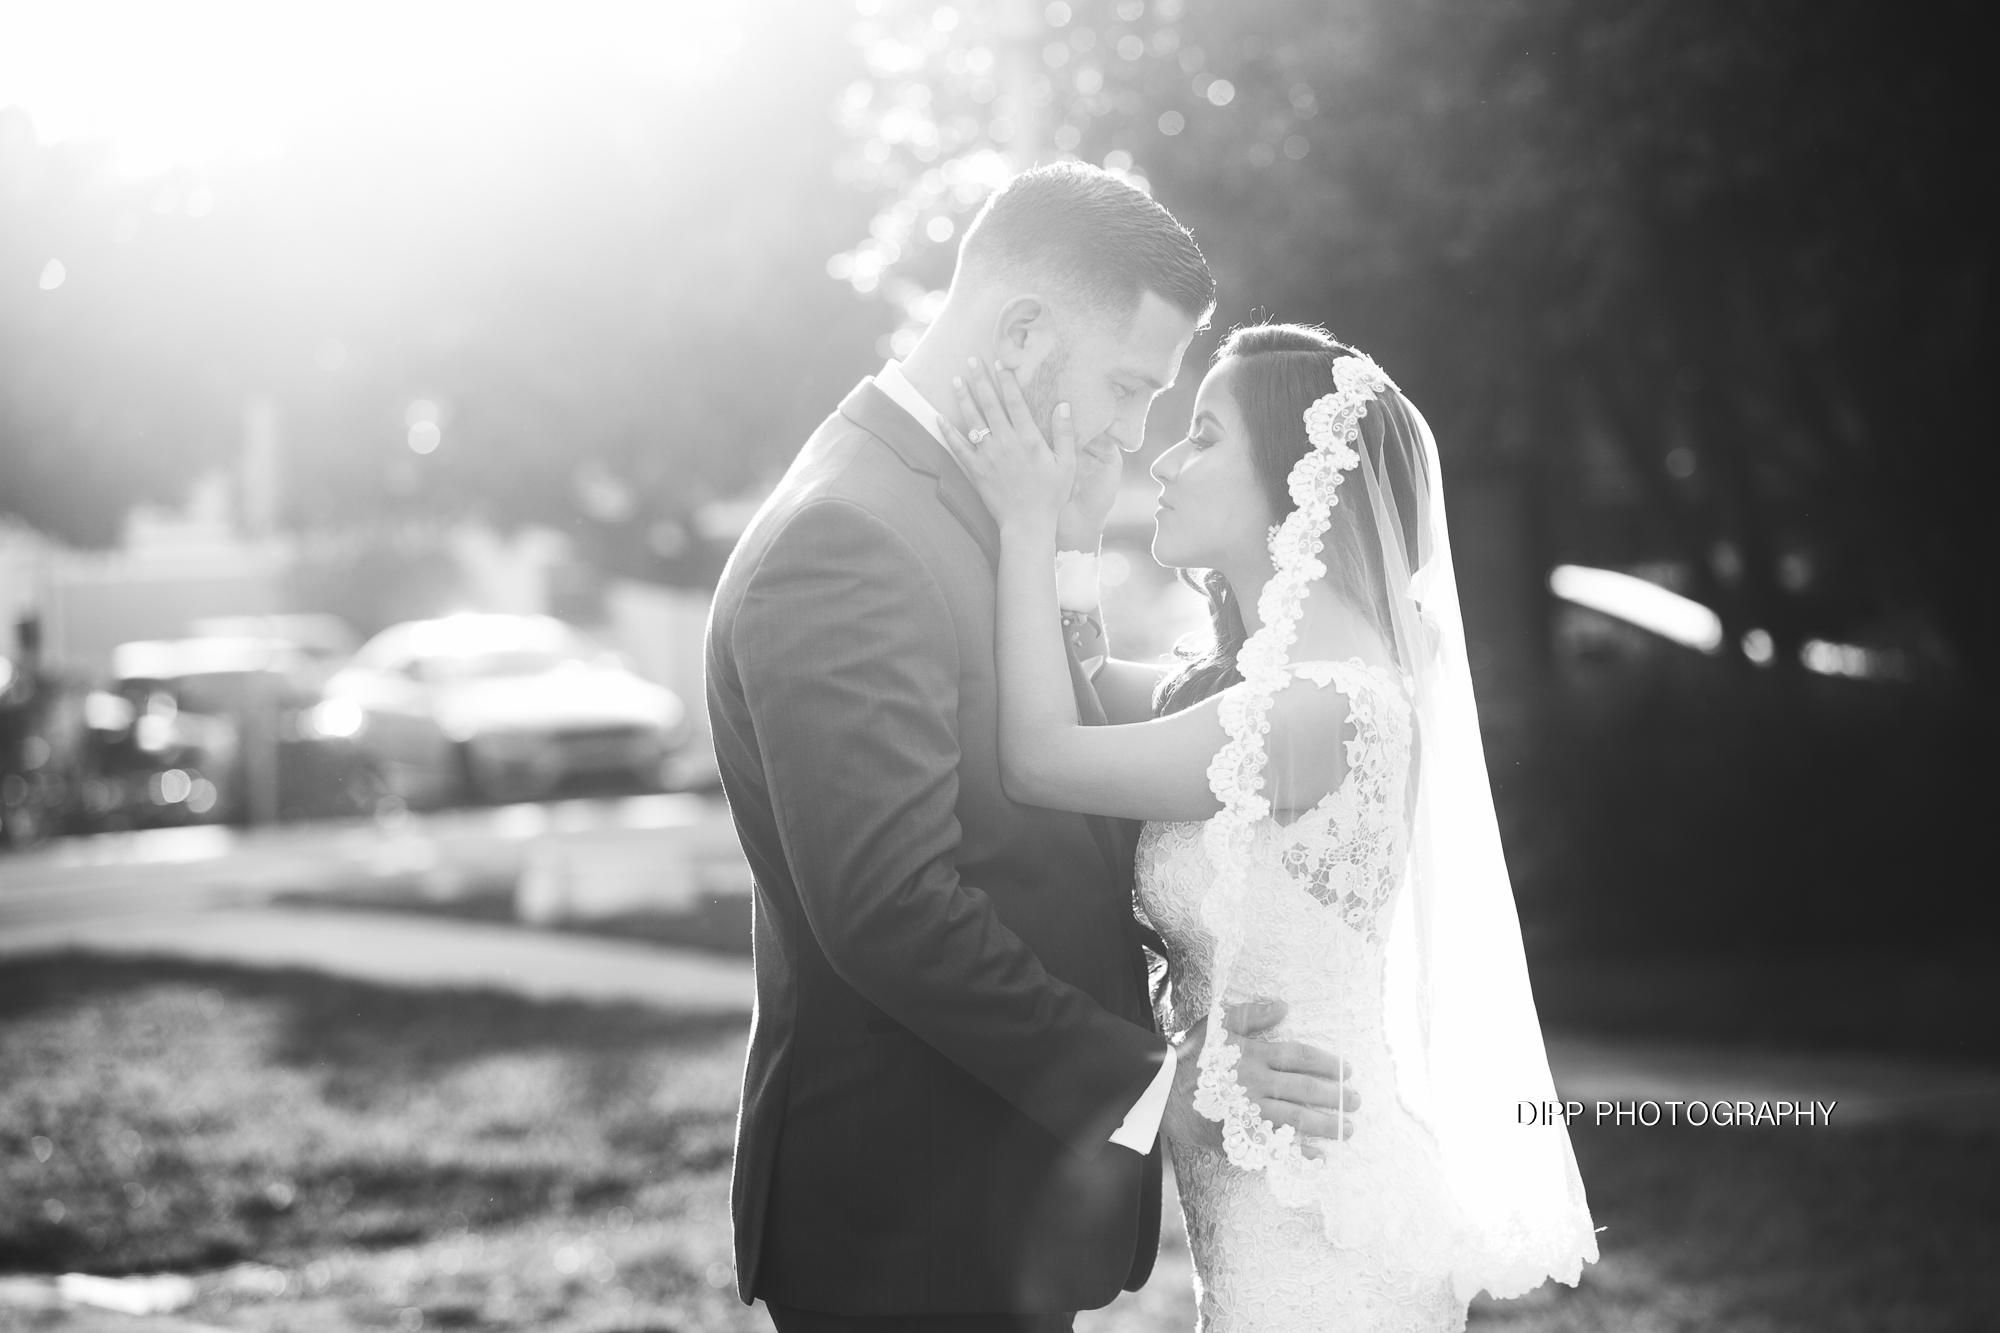 Dipp_2016 EDITED Melissa & Avilio Wedding-311